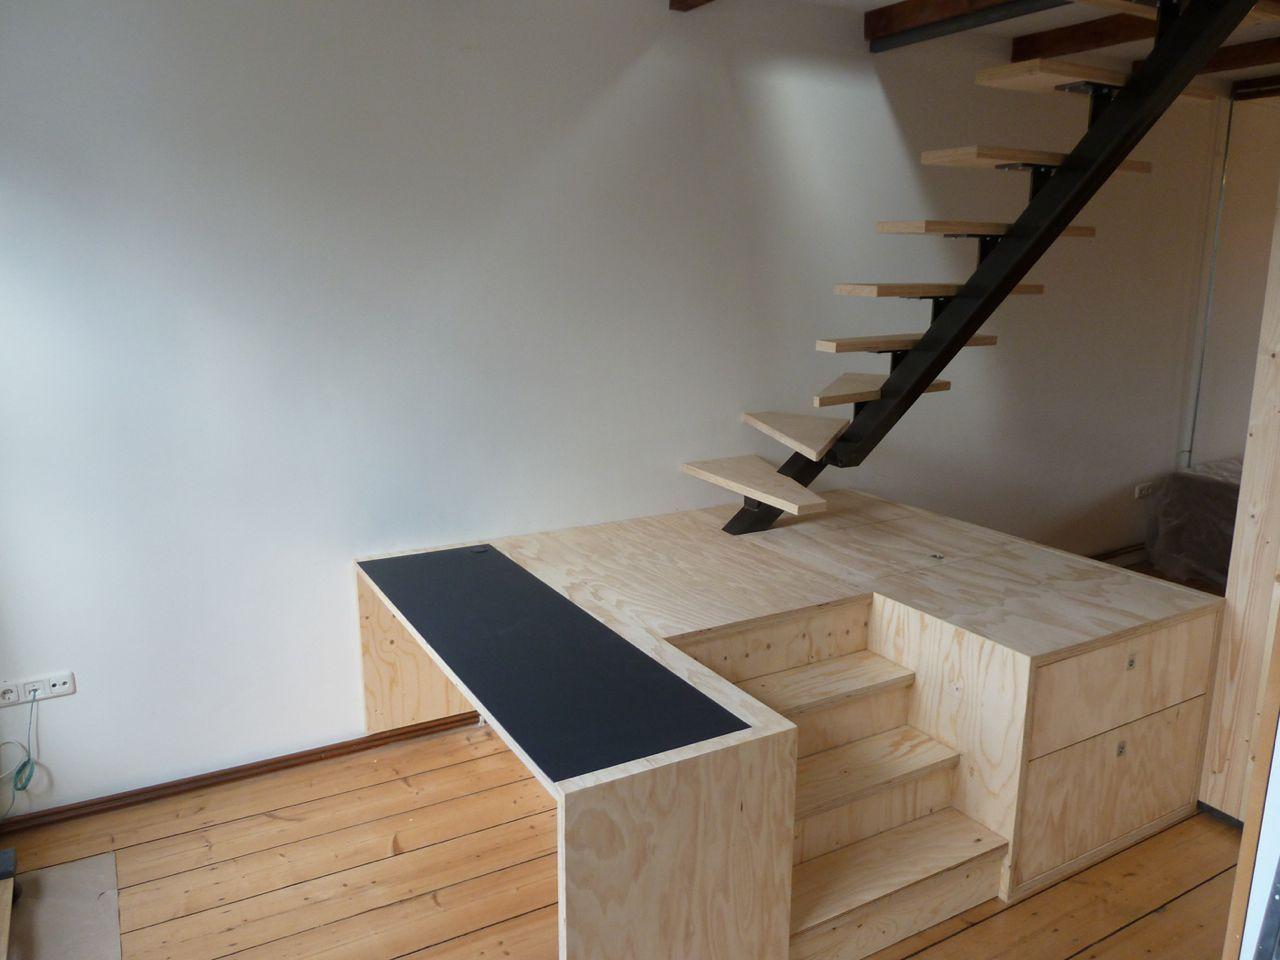 Trap bureau kast en commode in één. huis pinterest stairs